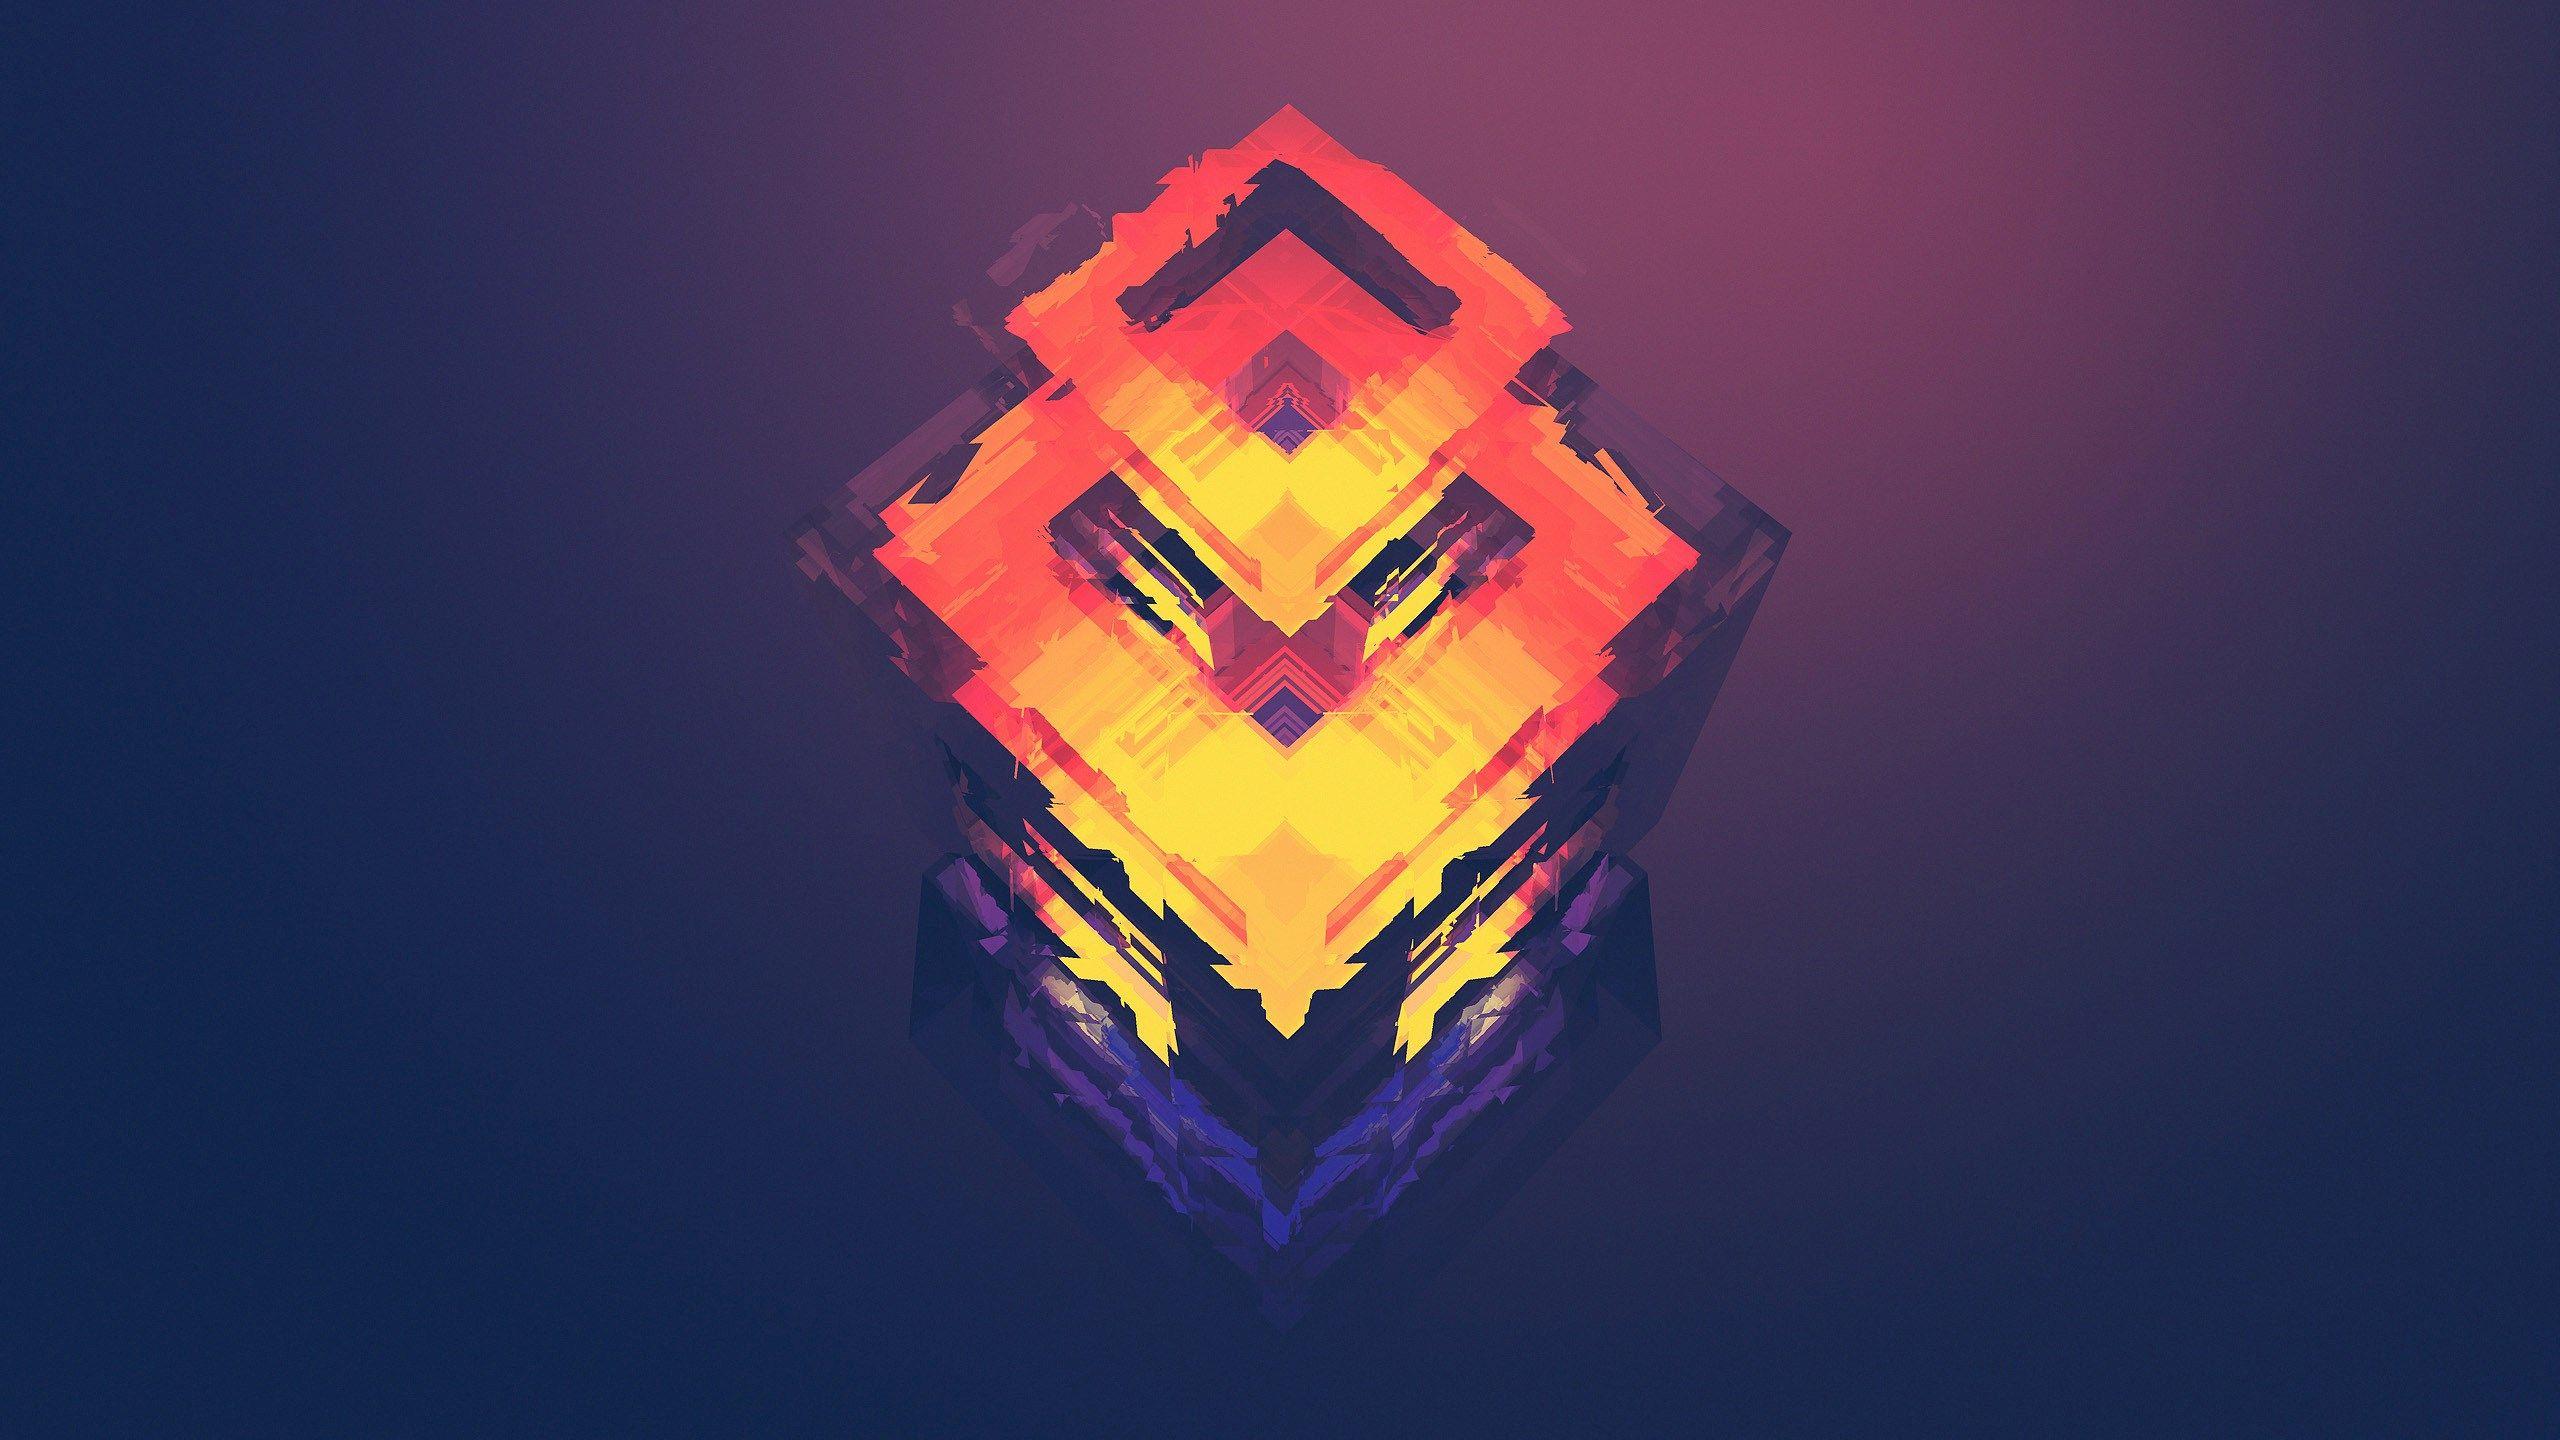 free download abstract minimalist wallpaper hd | Justin ...